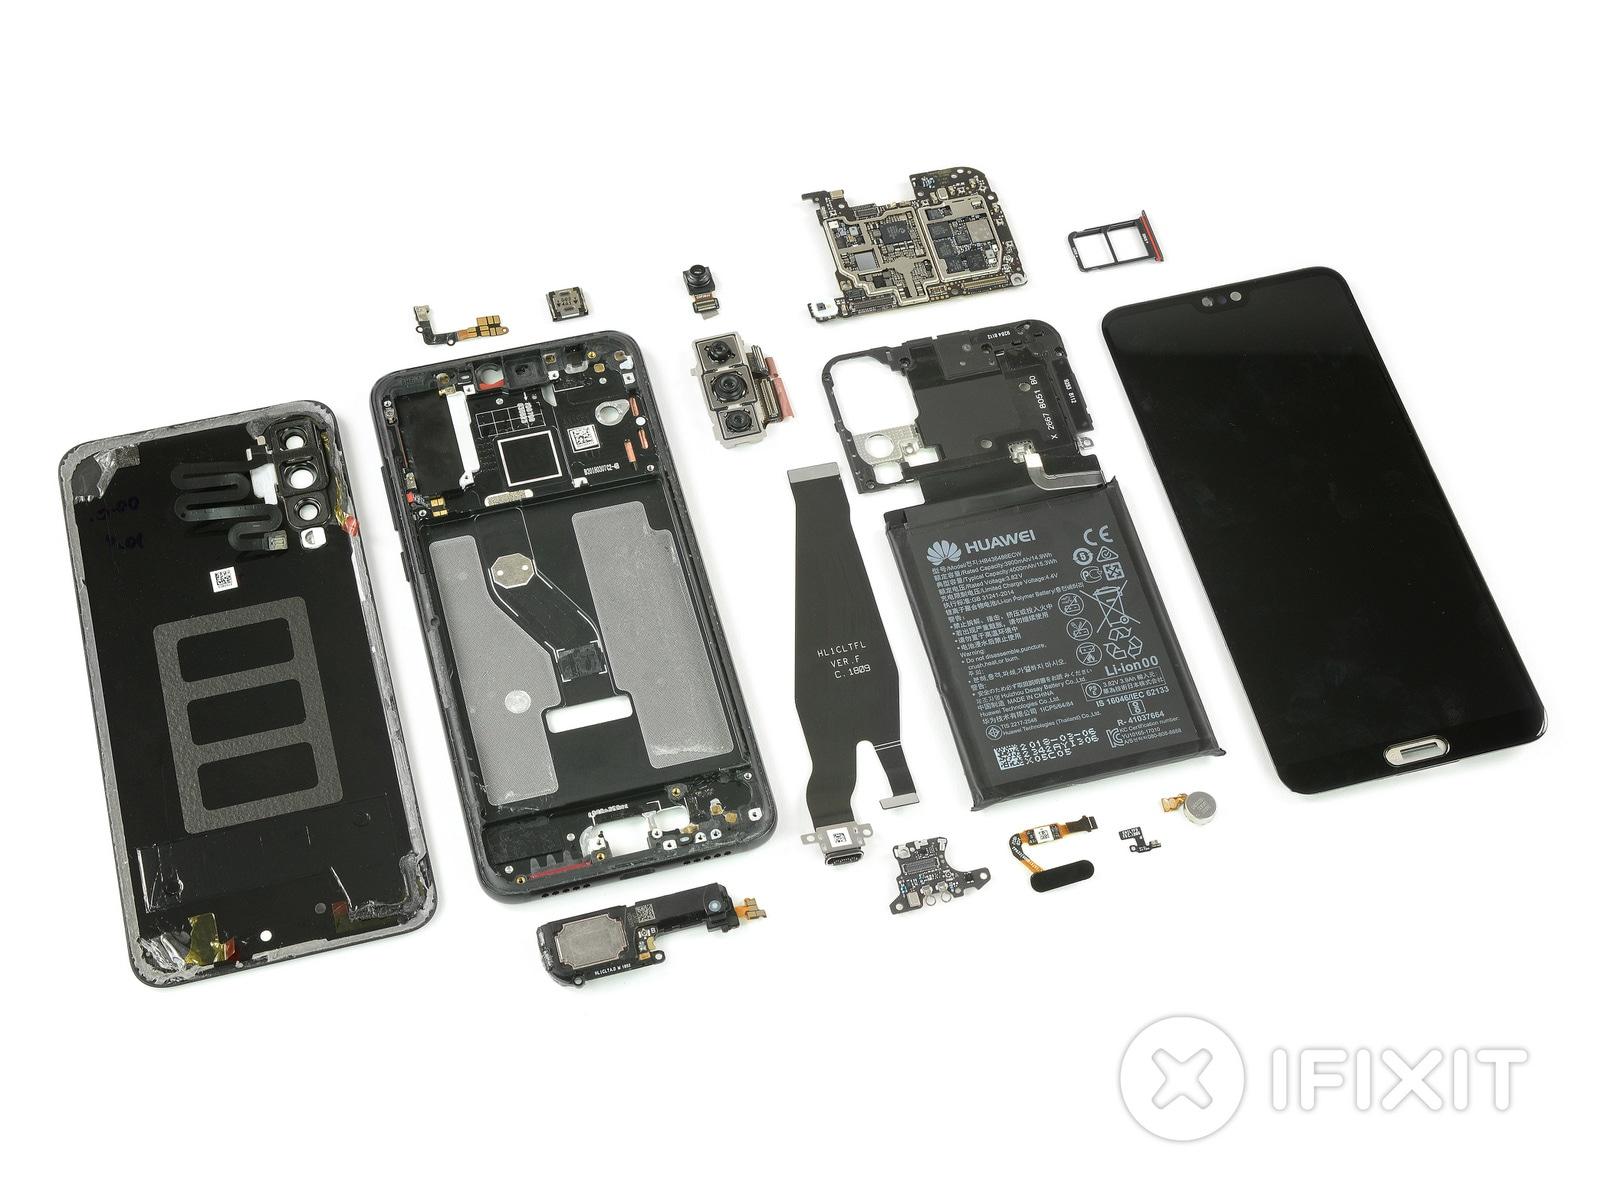 Huawei P20 Pro teardown. Image: iFixit